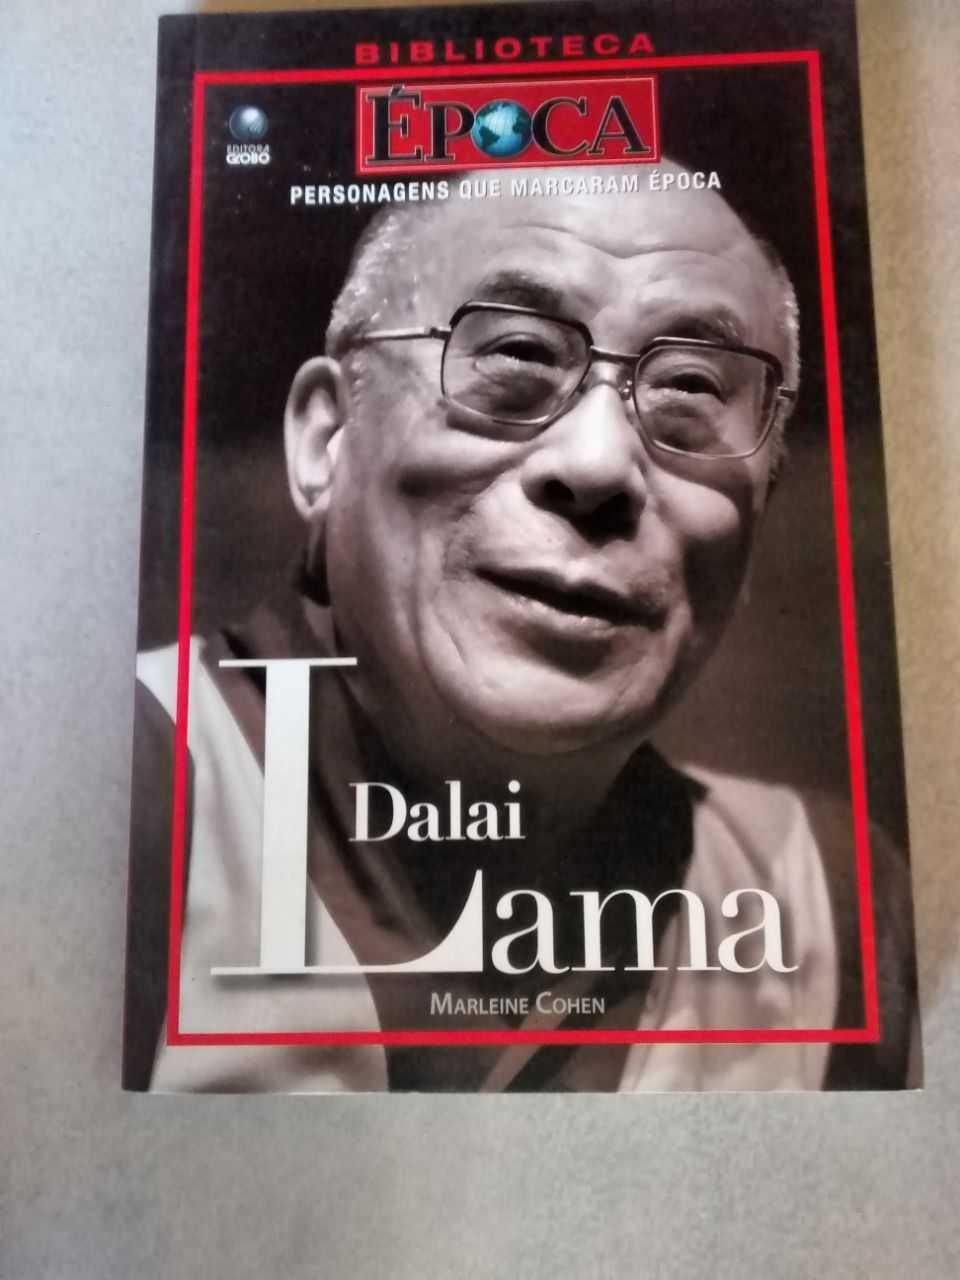 Dalai Lama: Época – Personagens que marcaram época